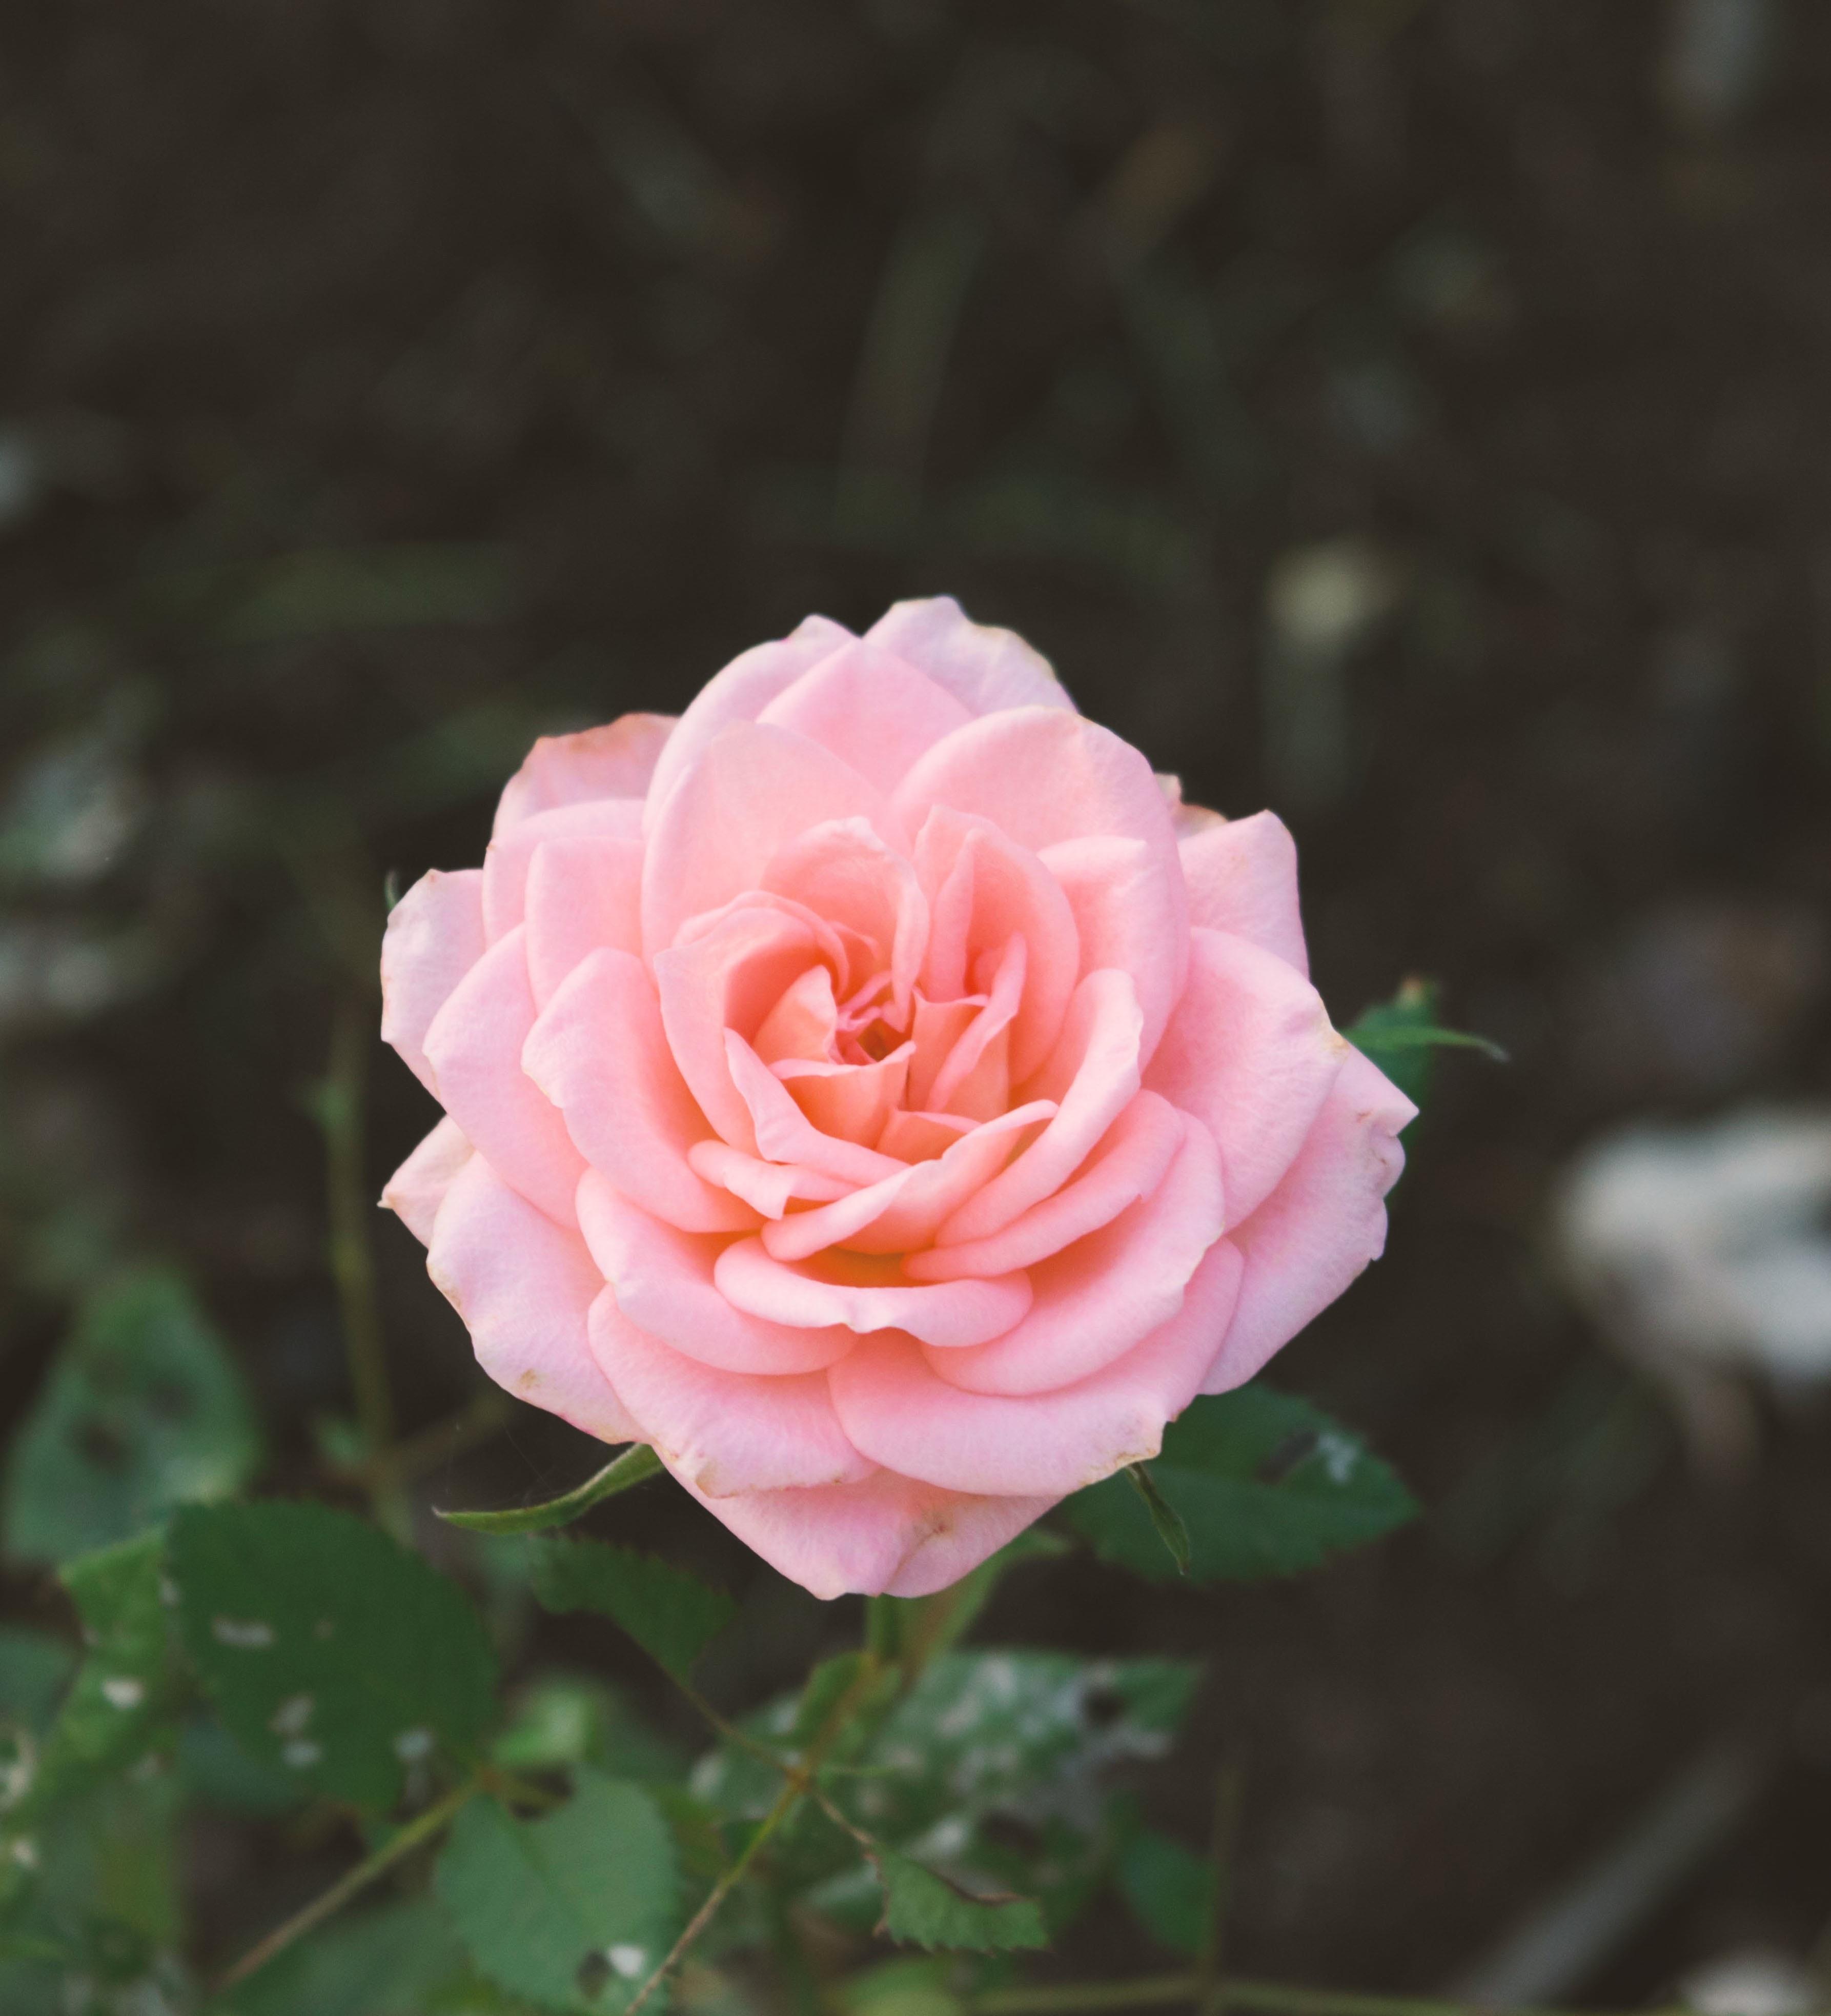 15 Most Beautiful Black Flowers: Fotos Gratis : Naturaleza, Flor, Pétalo, Romántico, Rosado